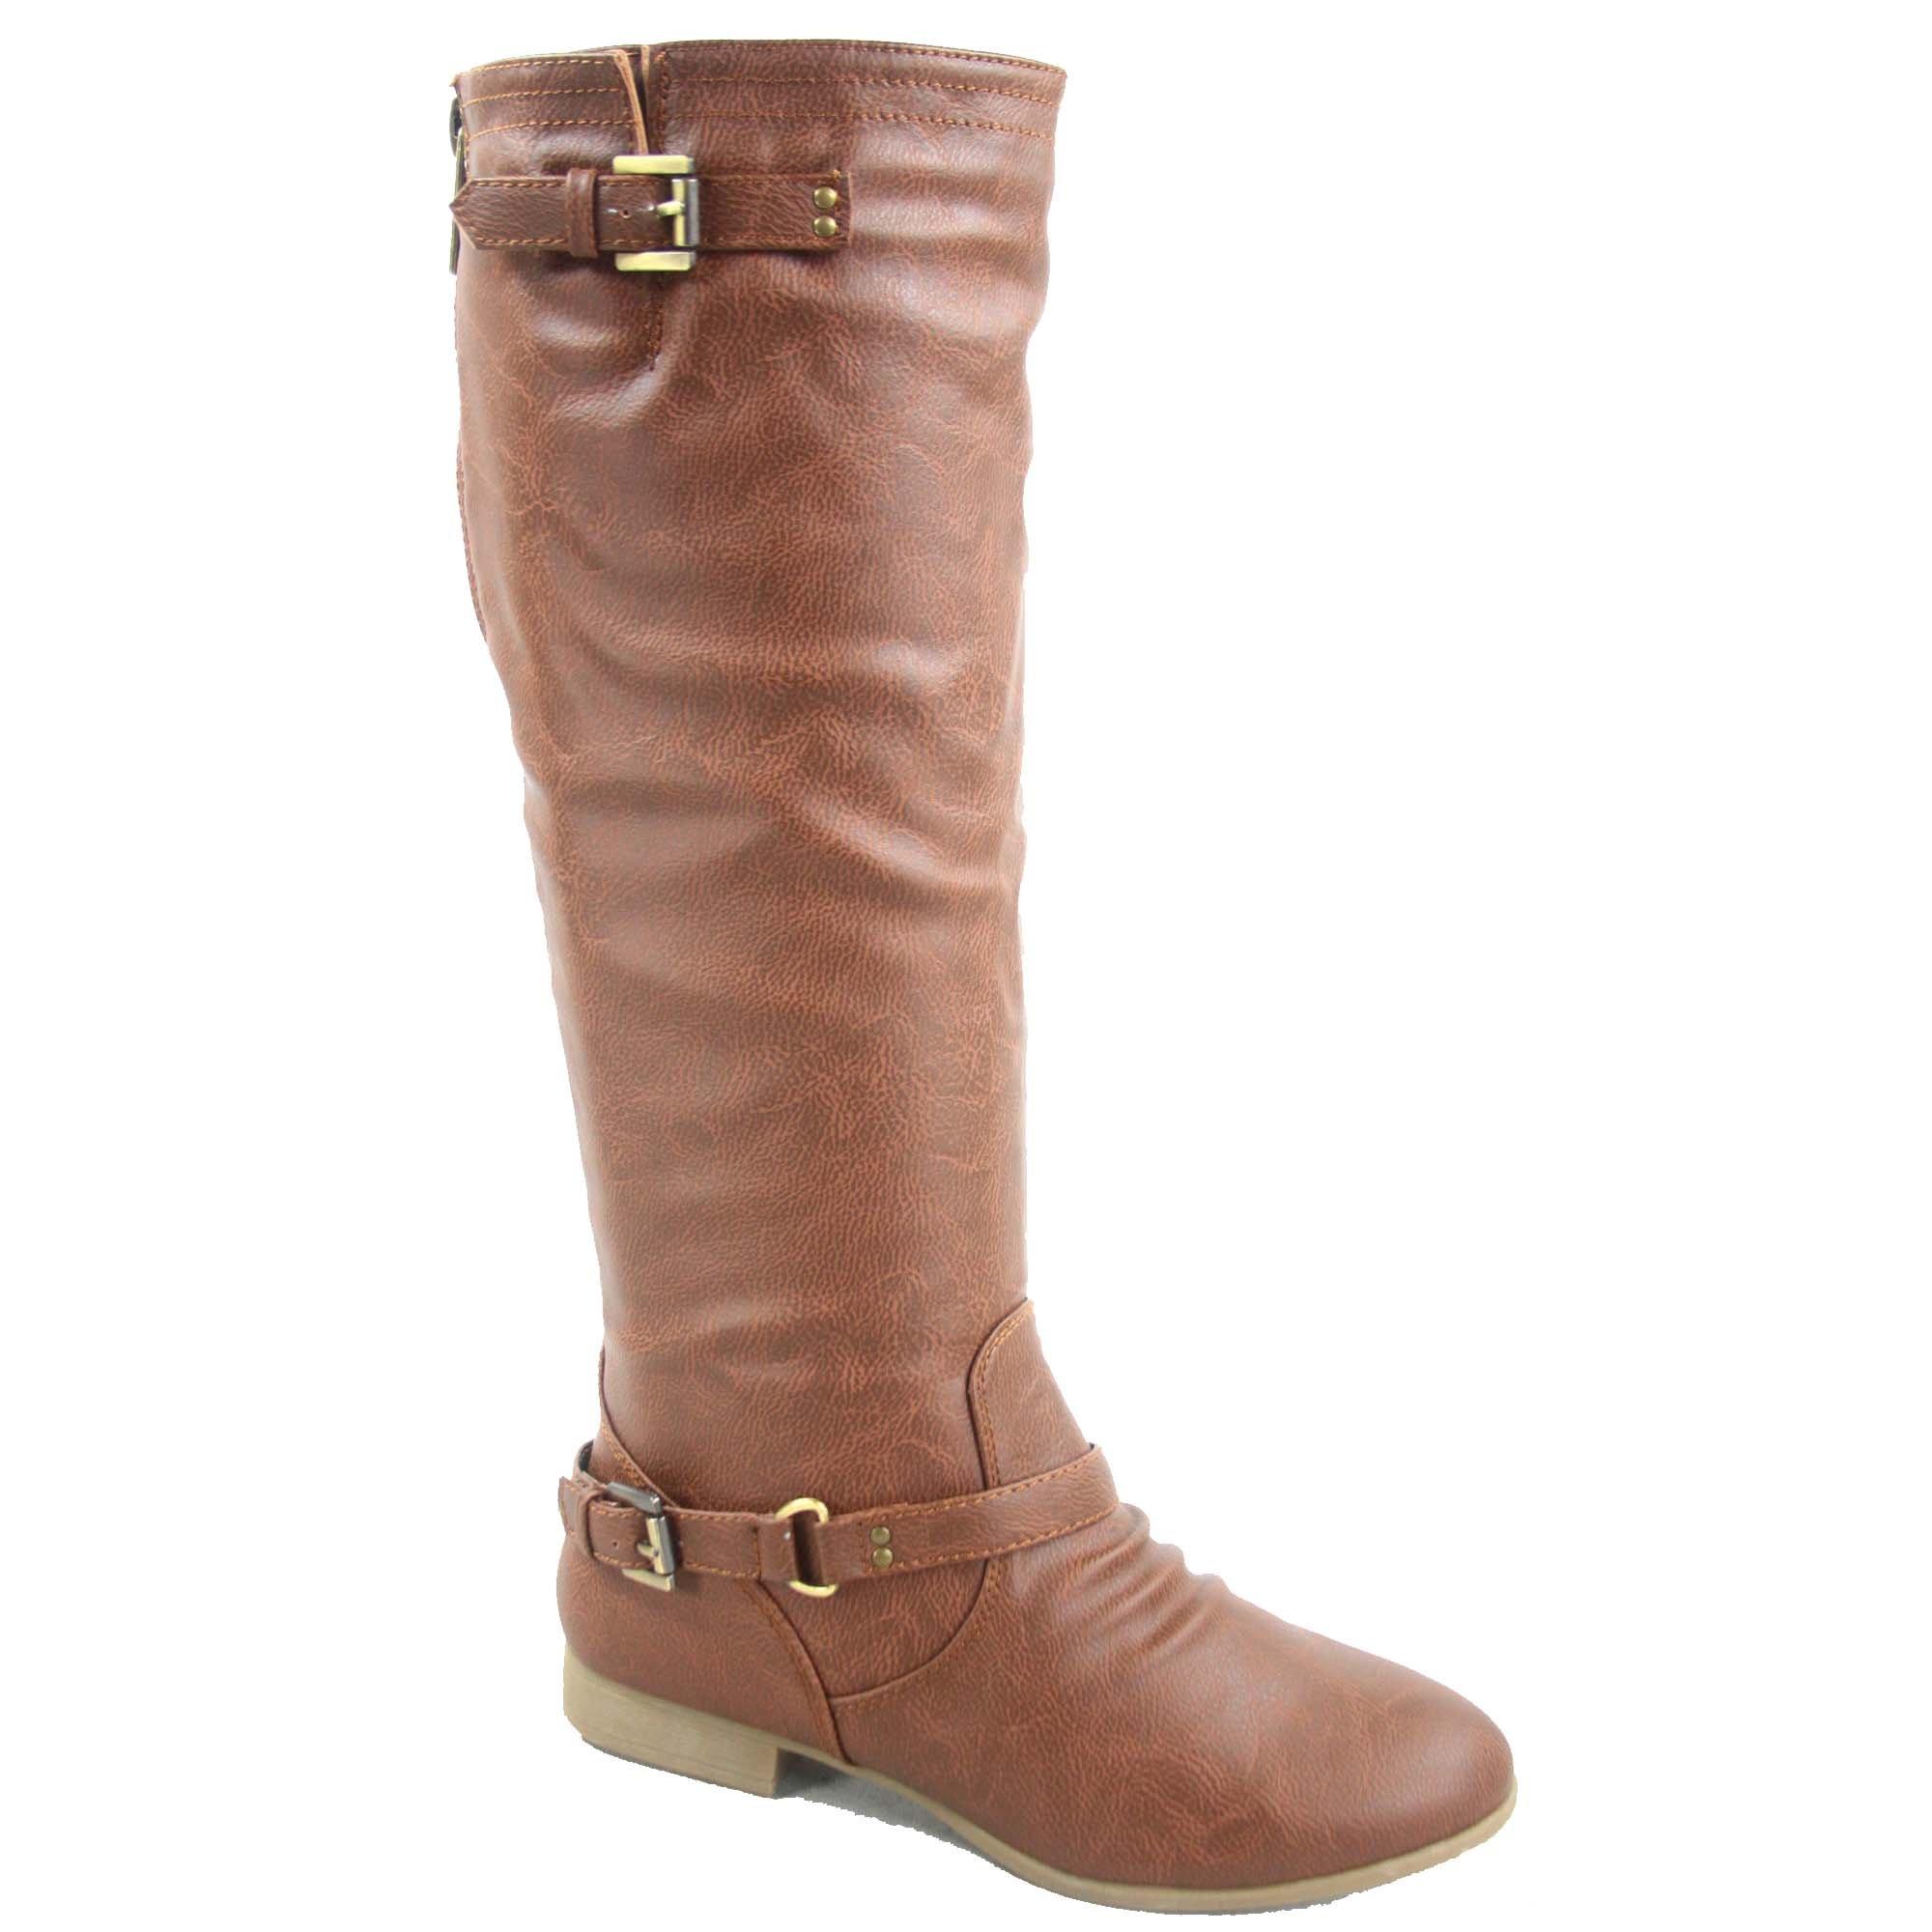 Top Moda Coco-1 Women's Fashion Military Low Heel Buckle Zipper Riding Knee High Boot Shoes (6, Tan)